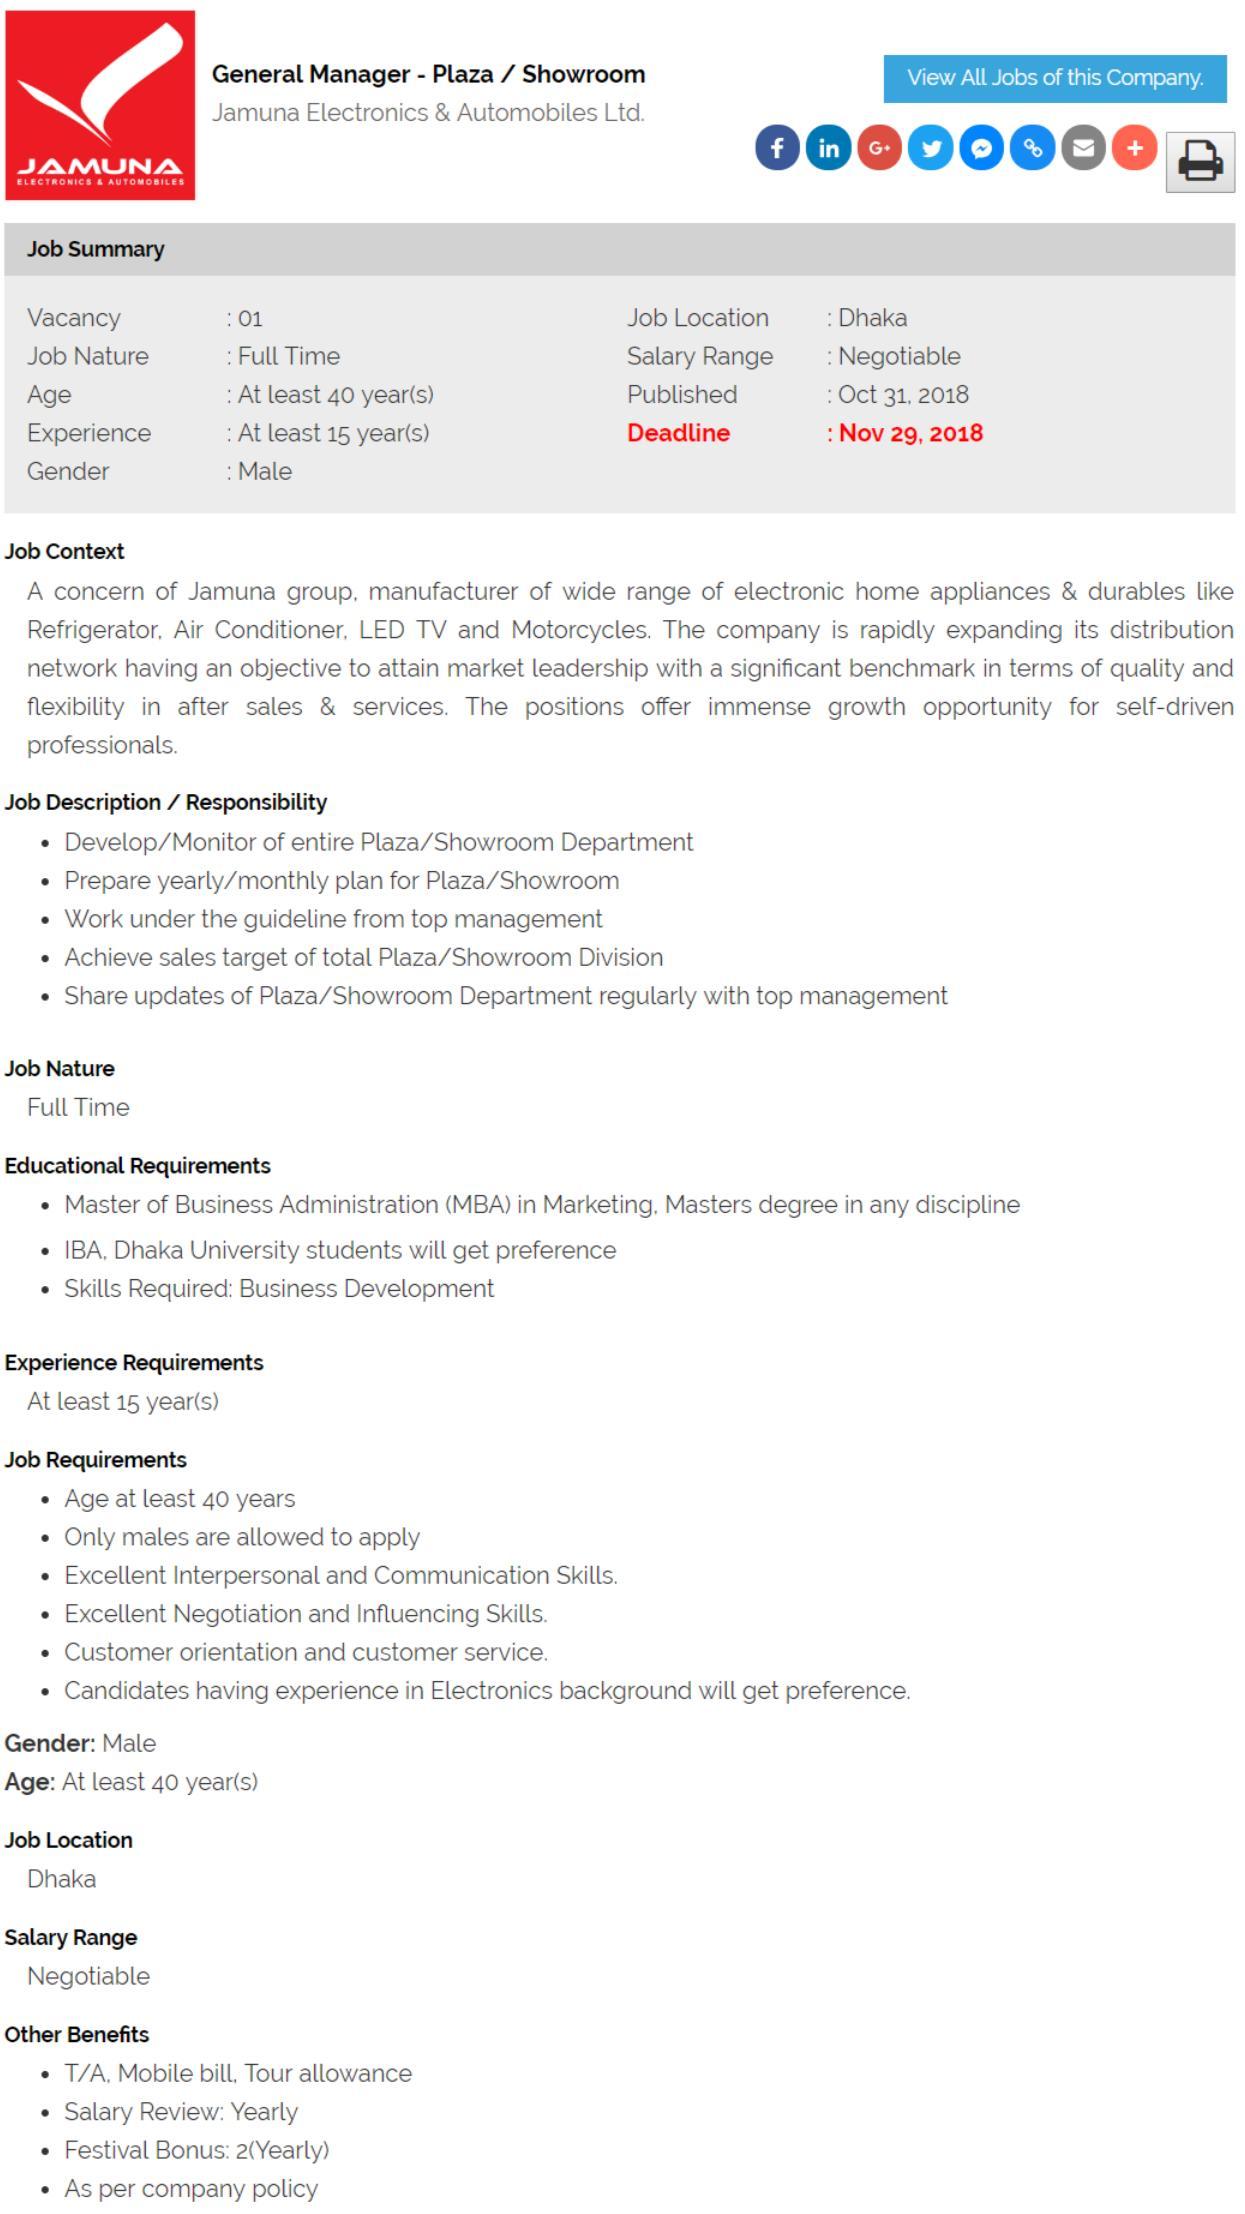 General Manager - Plaza _ Showroom - Jamuna Electronics Automobiles Limited job circular